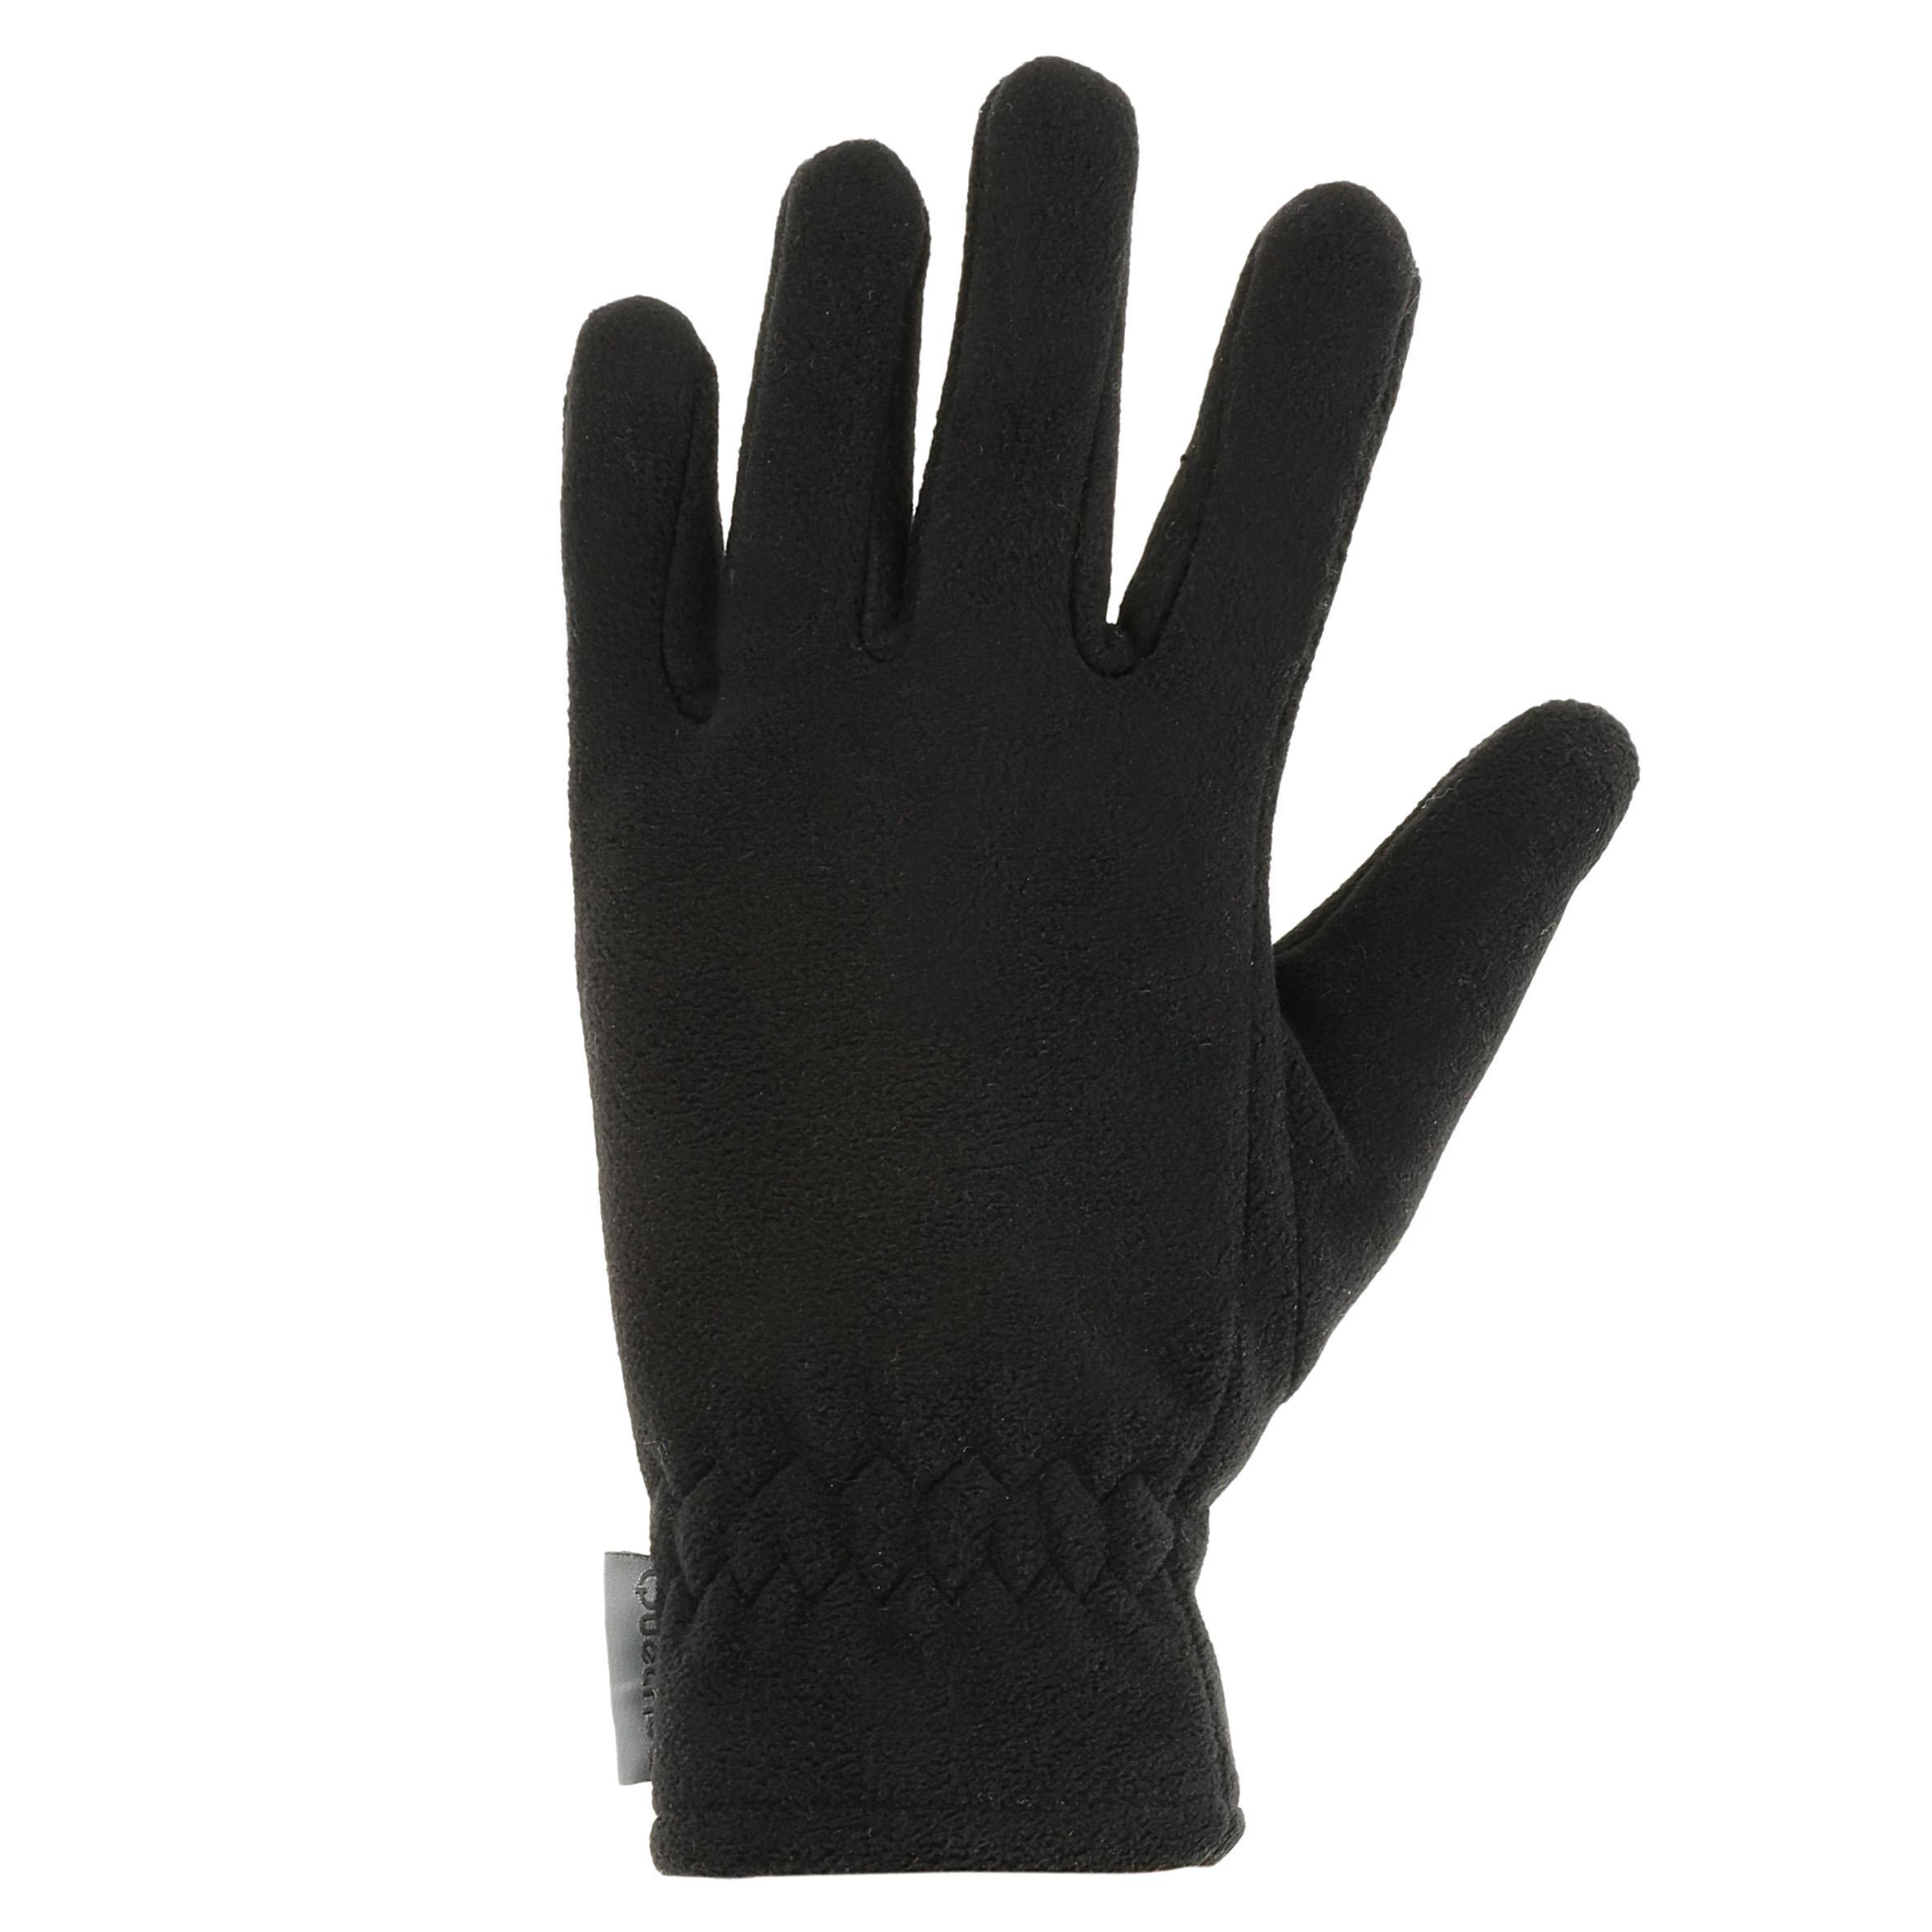 Mănuși din Polar copii imagine